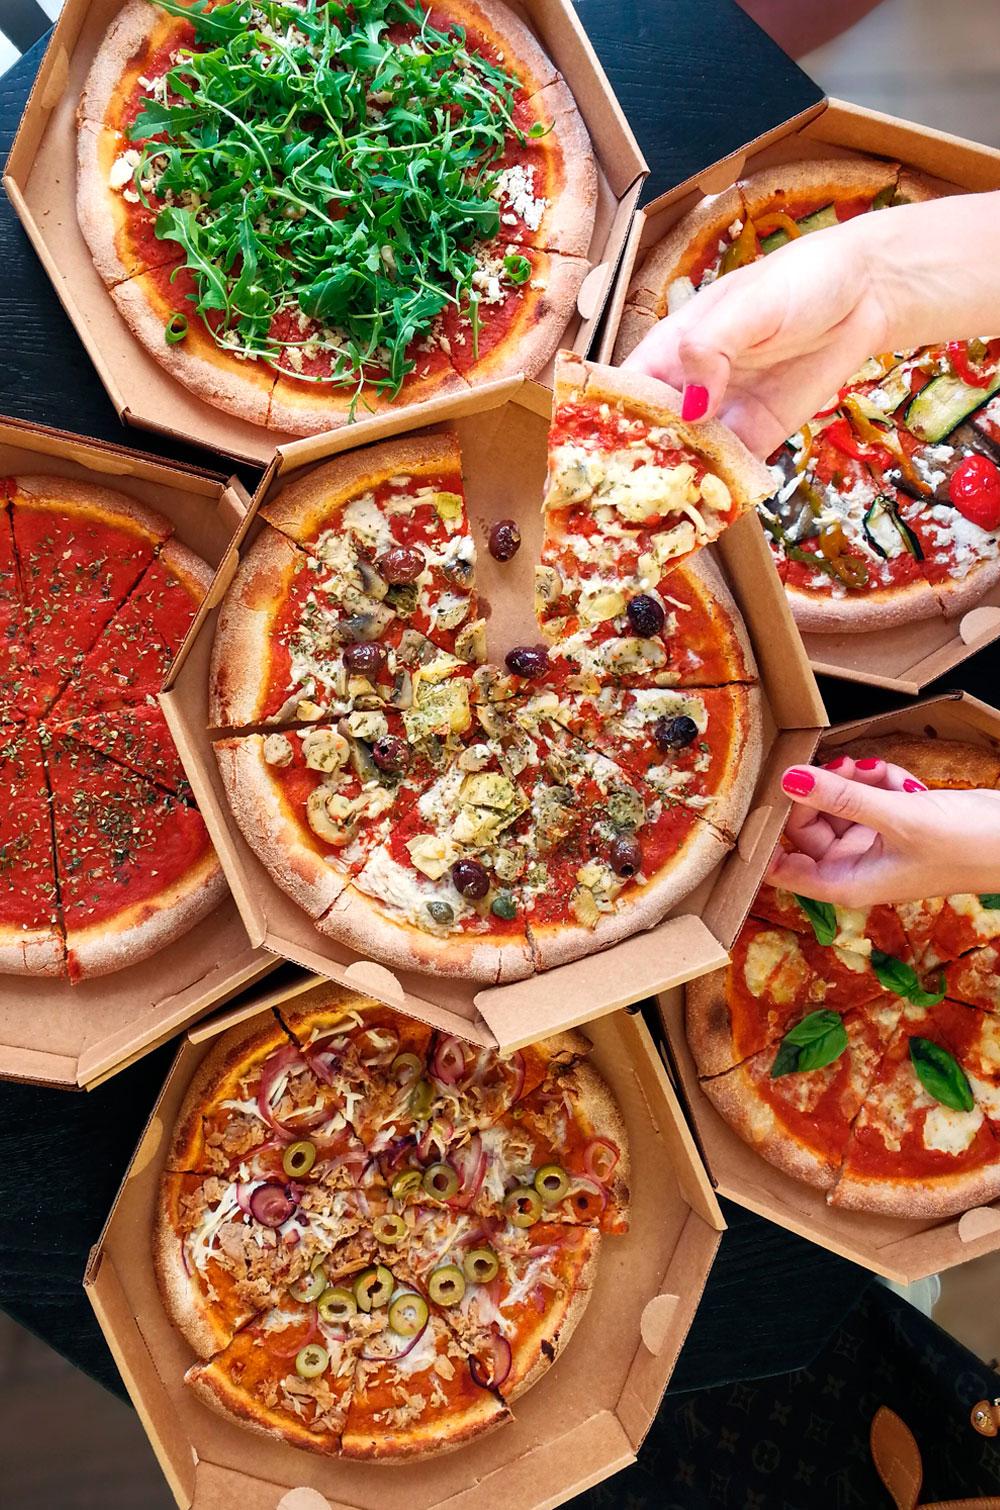 venezia: dove mangiare la pizza vegana